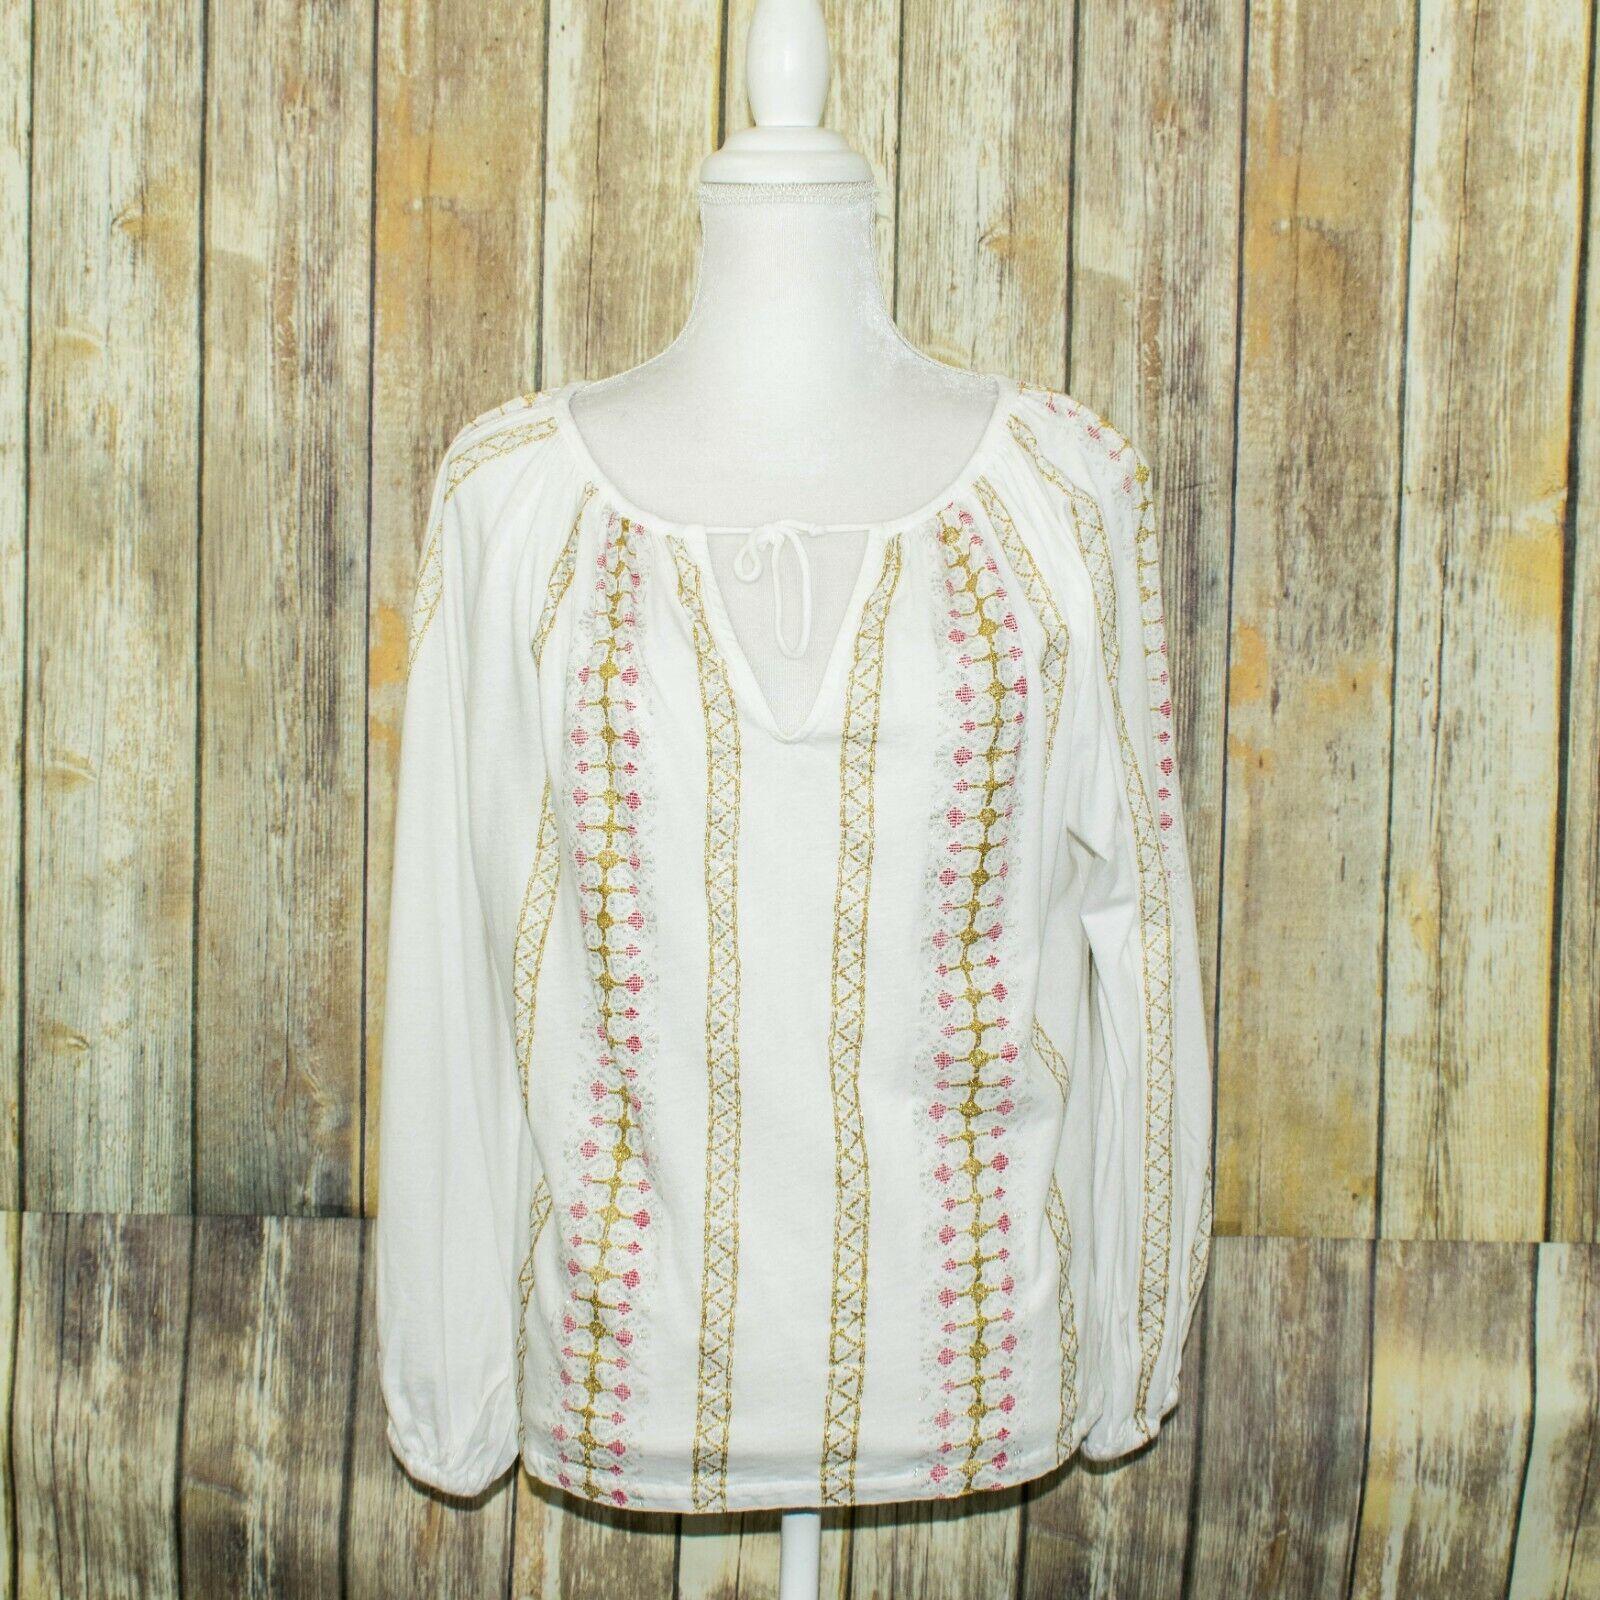 Mes Domoiselles Woherren JAIME BOHO Blouse Weiß Embroiderot Striped Sz 40